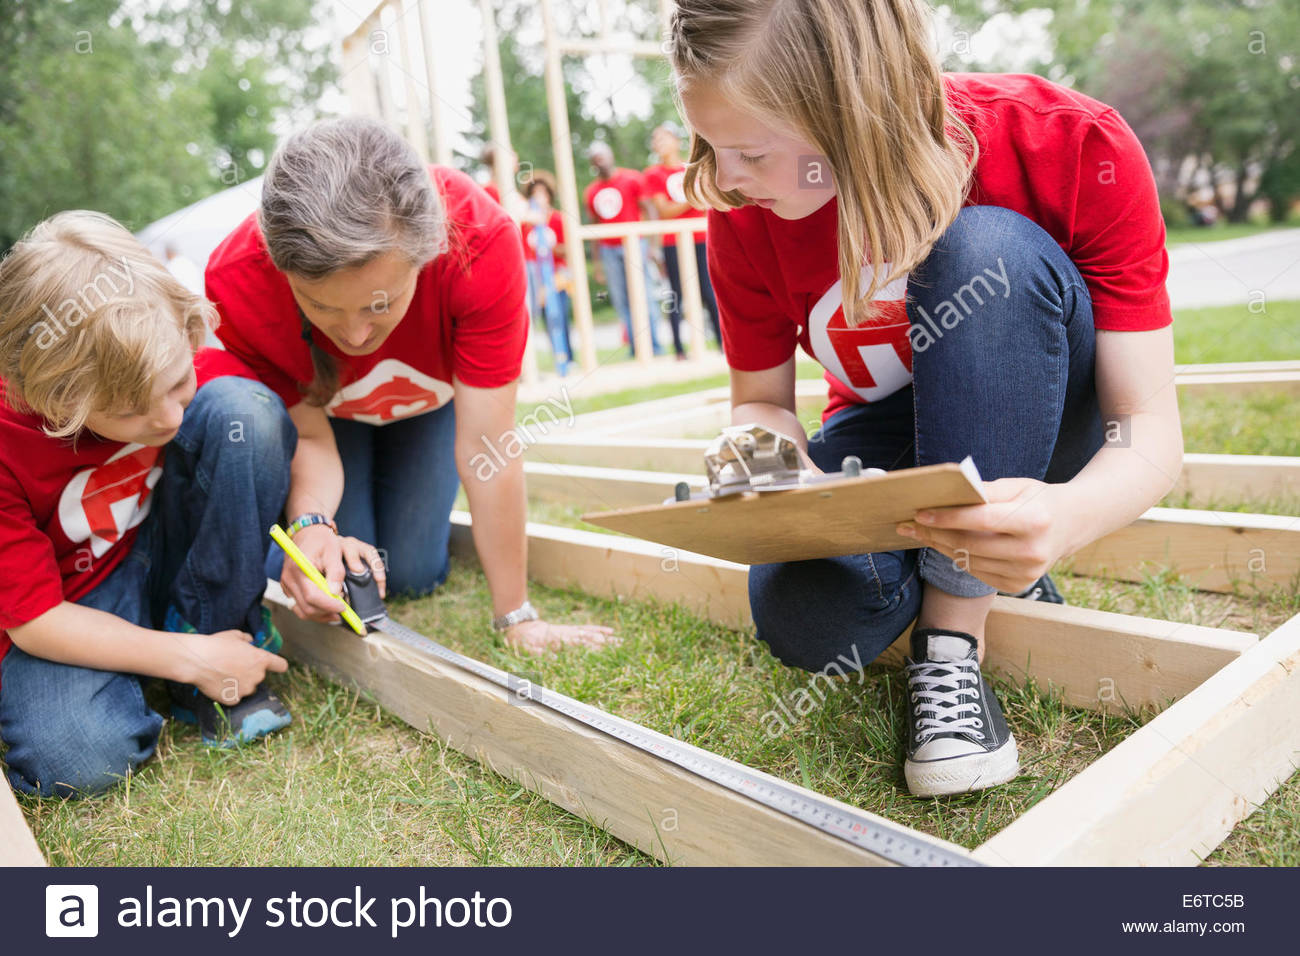 Mesurer avec châssis construction bénévoles ruban de mesure Photo Stock